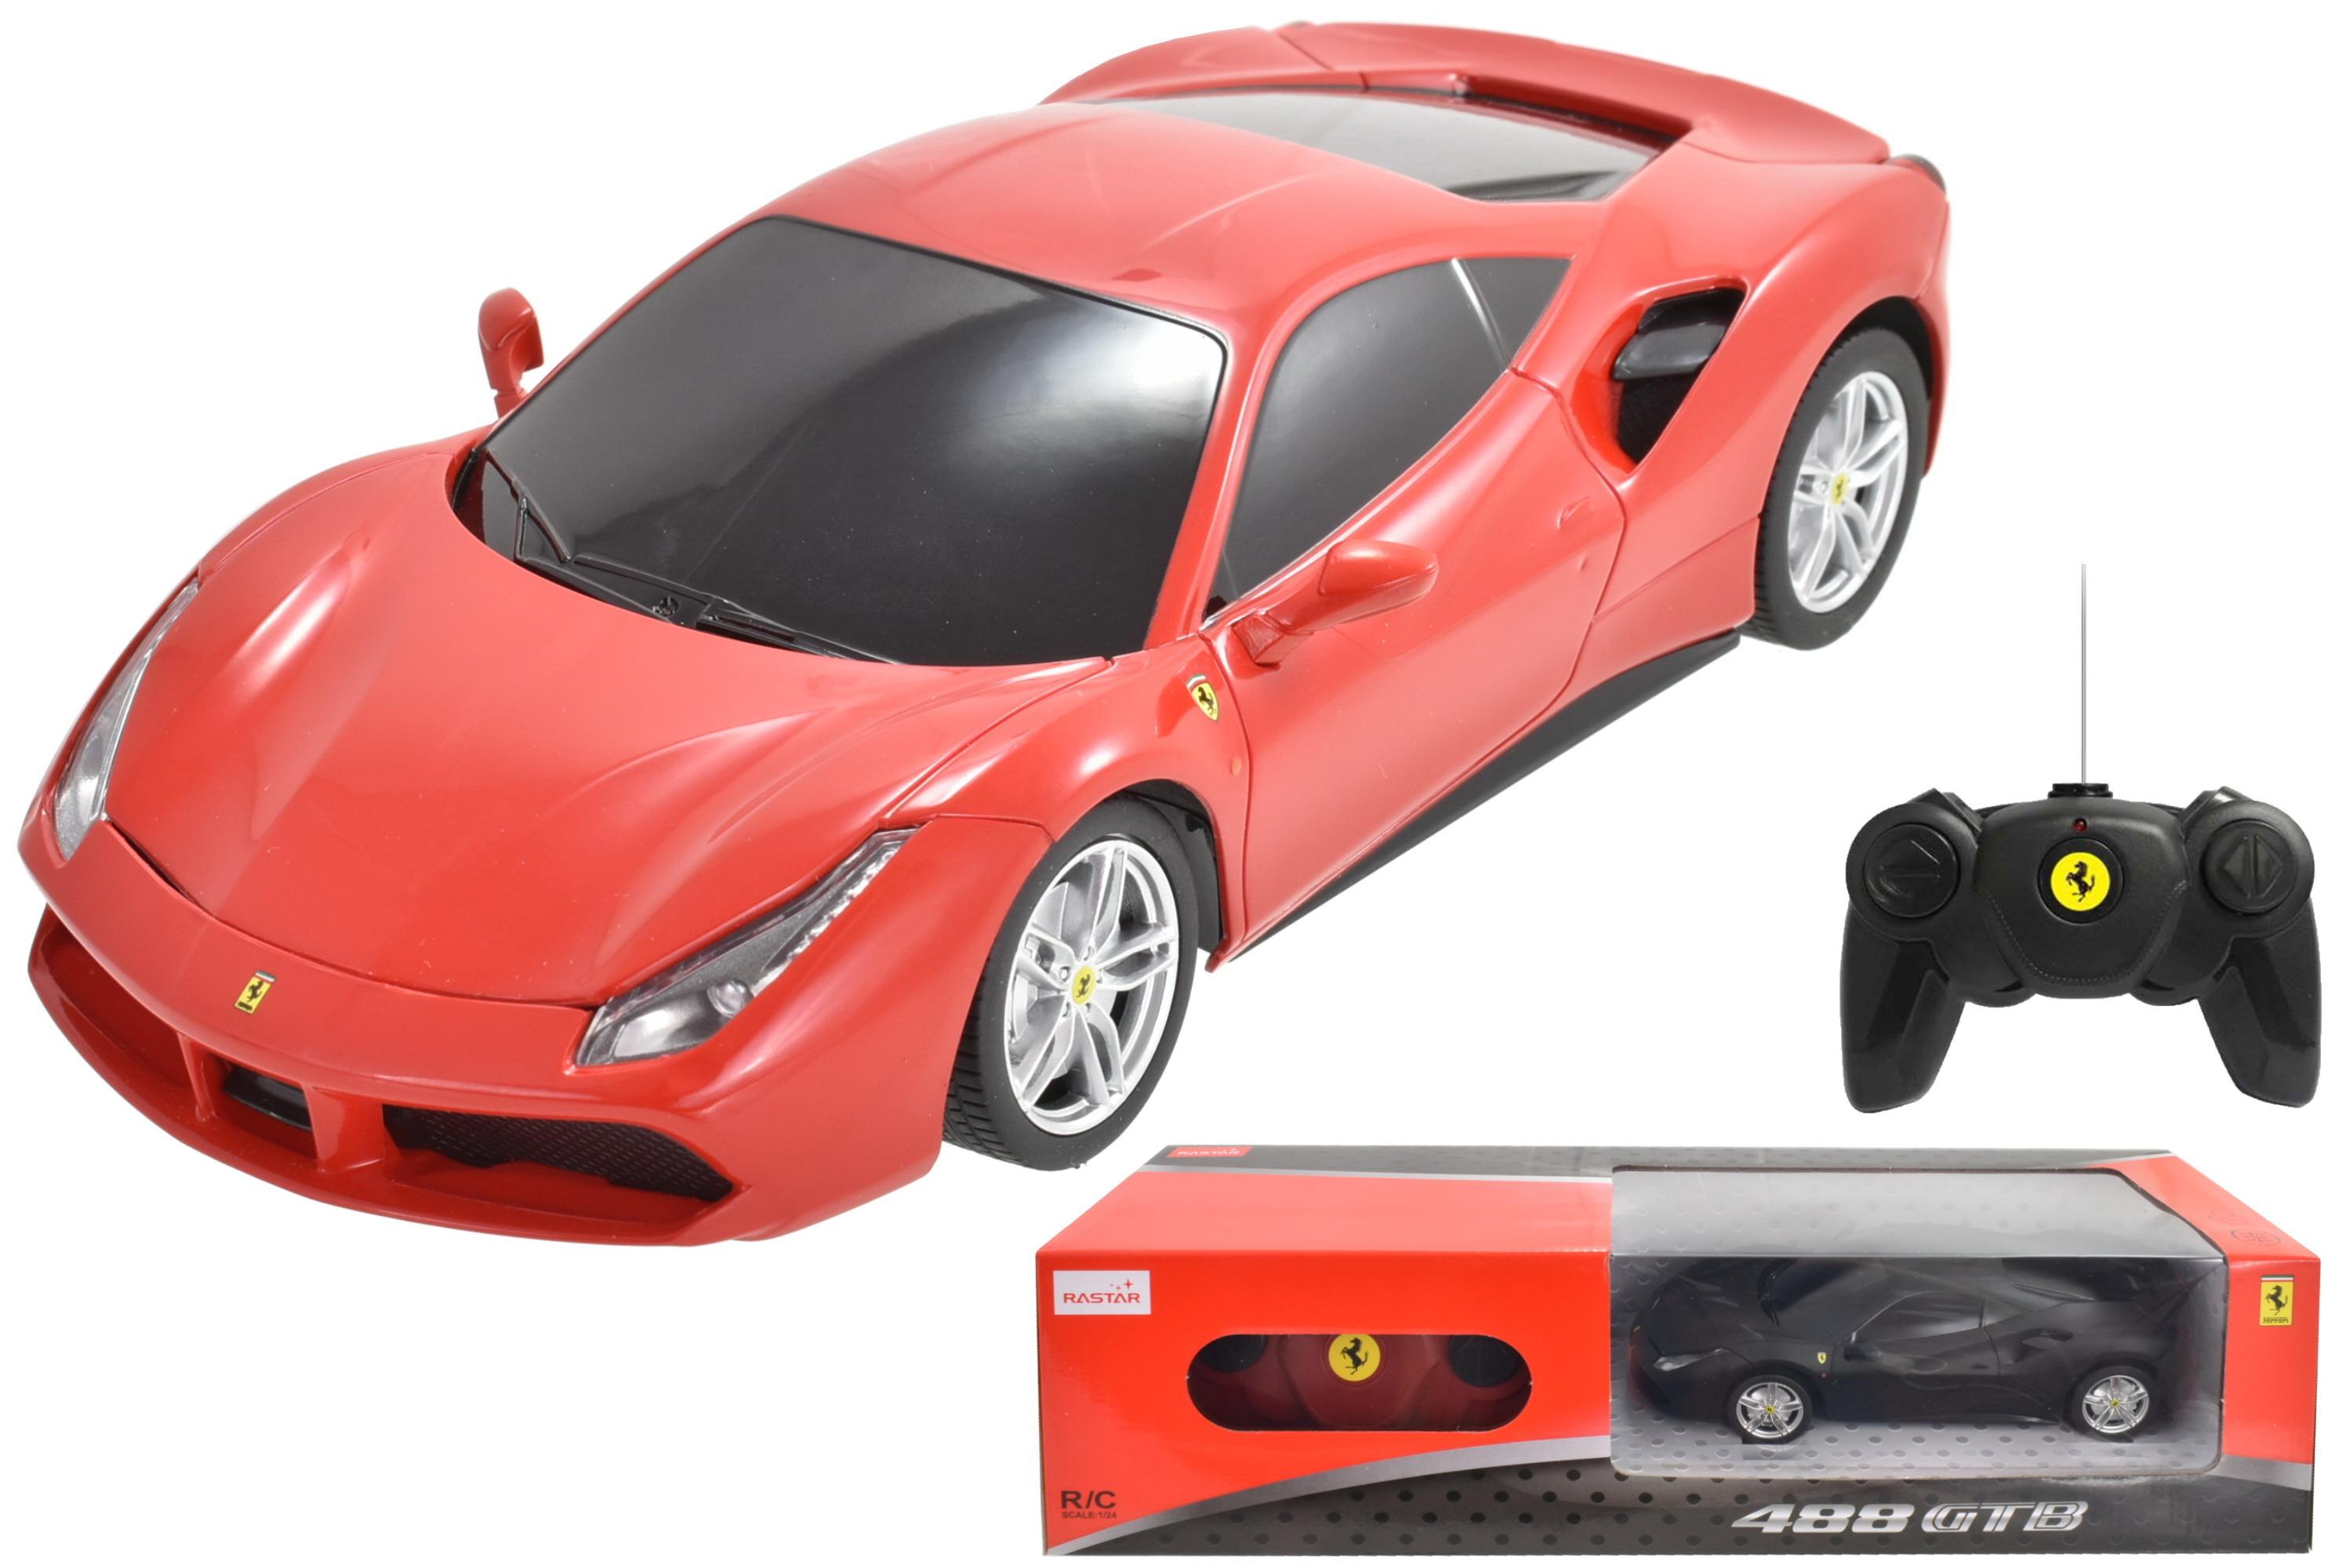 1:24sc R/C Ferrari 488 Gtb